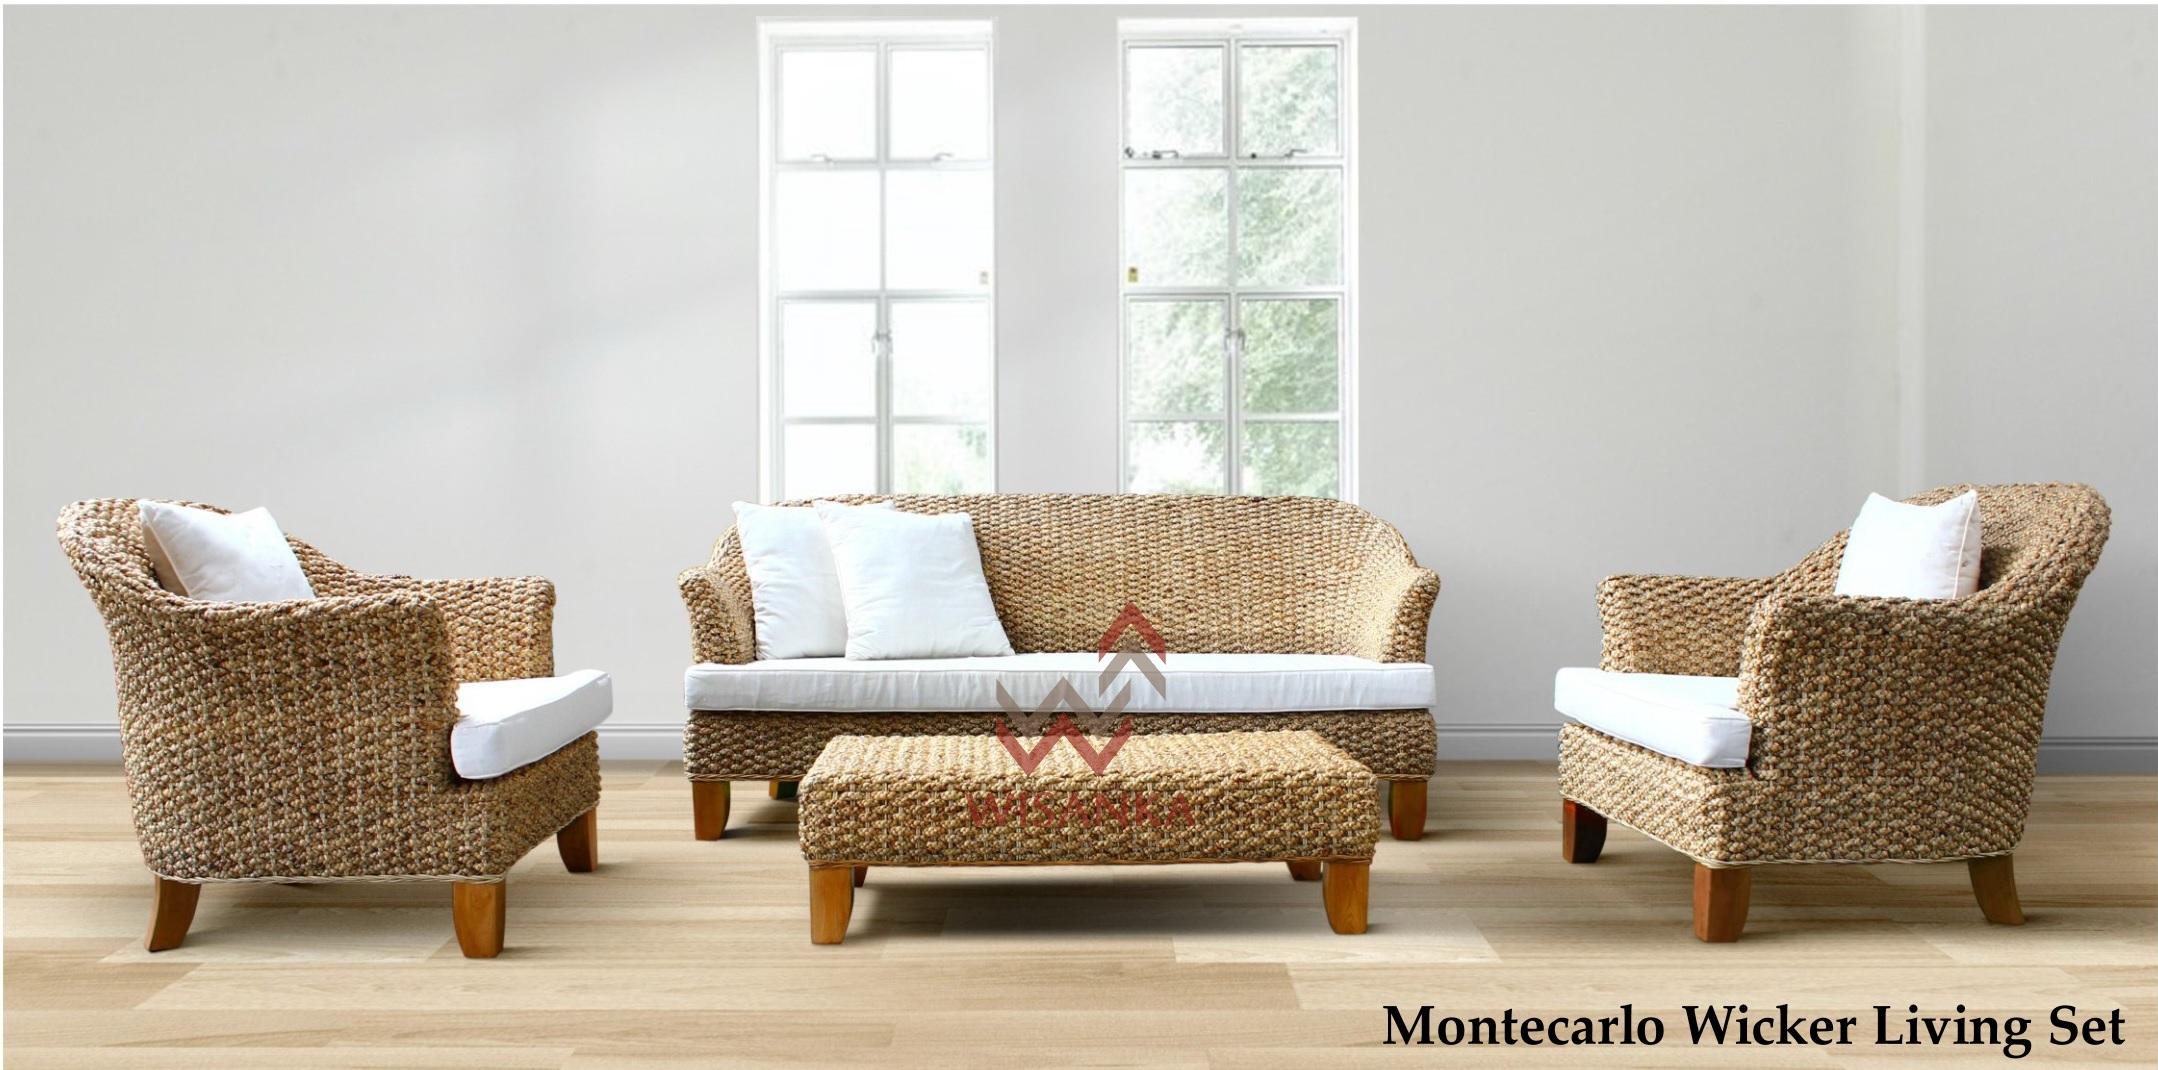 Montecarlo Wicker Living Set | Natural Rattan Furniture | Wicker ...